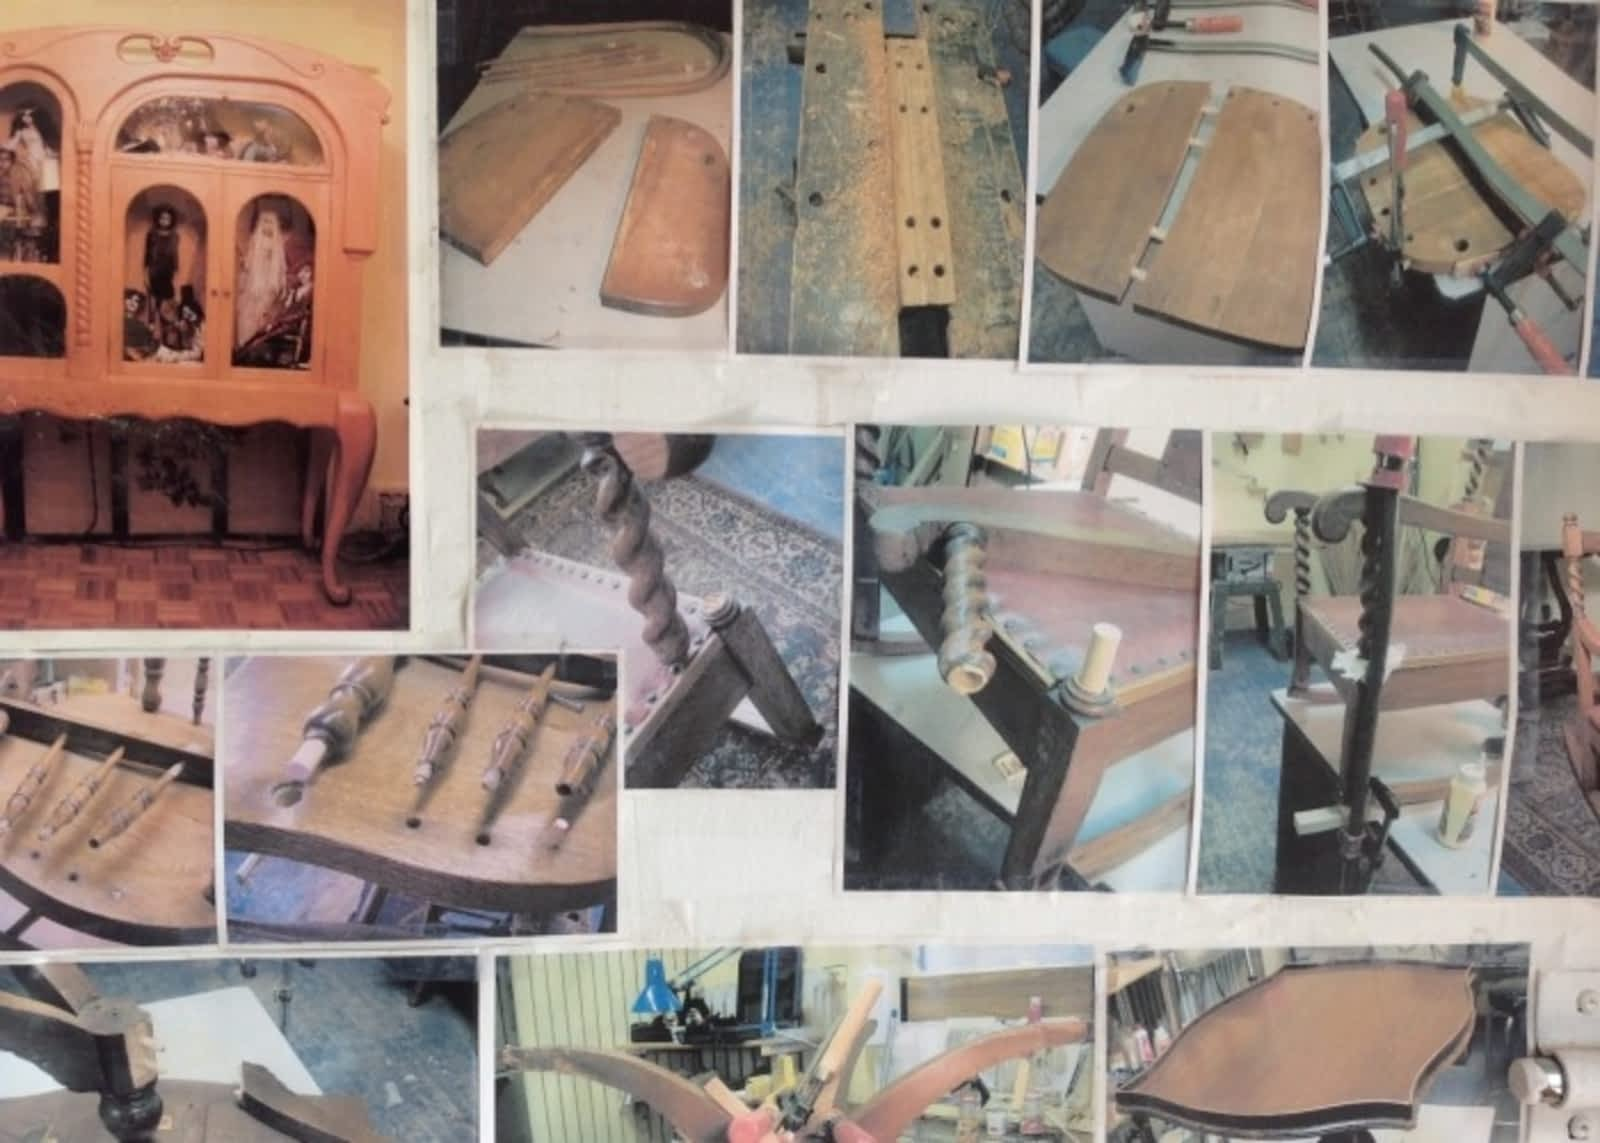 Awe Inspiring Broken Leg Furniture Repair Opening Hours B 1600 Gerrard Interior Design Ideas Lukepblogthenellocom